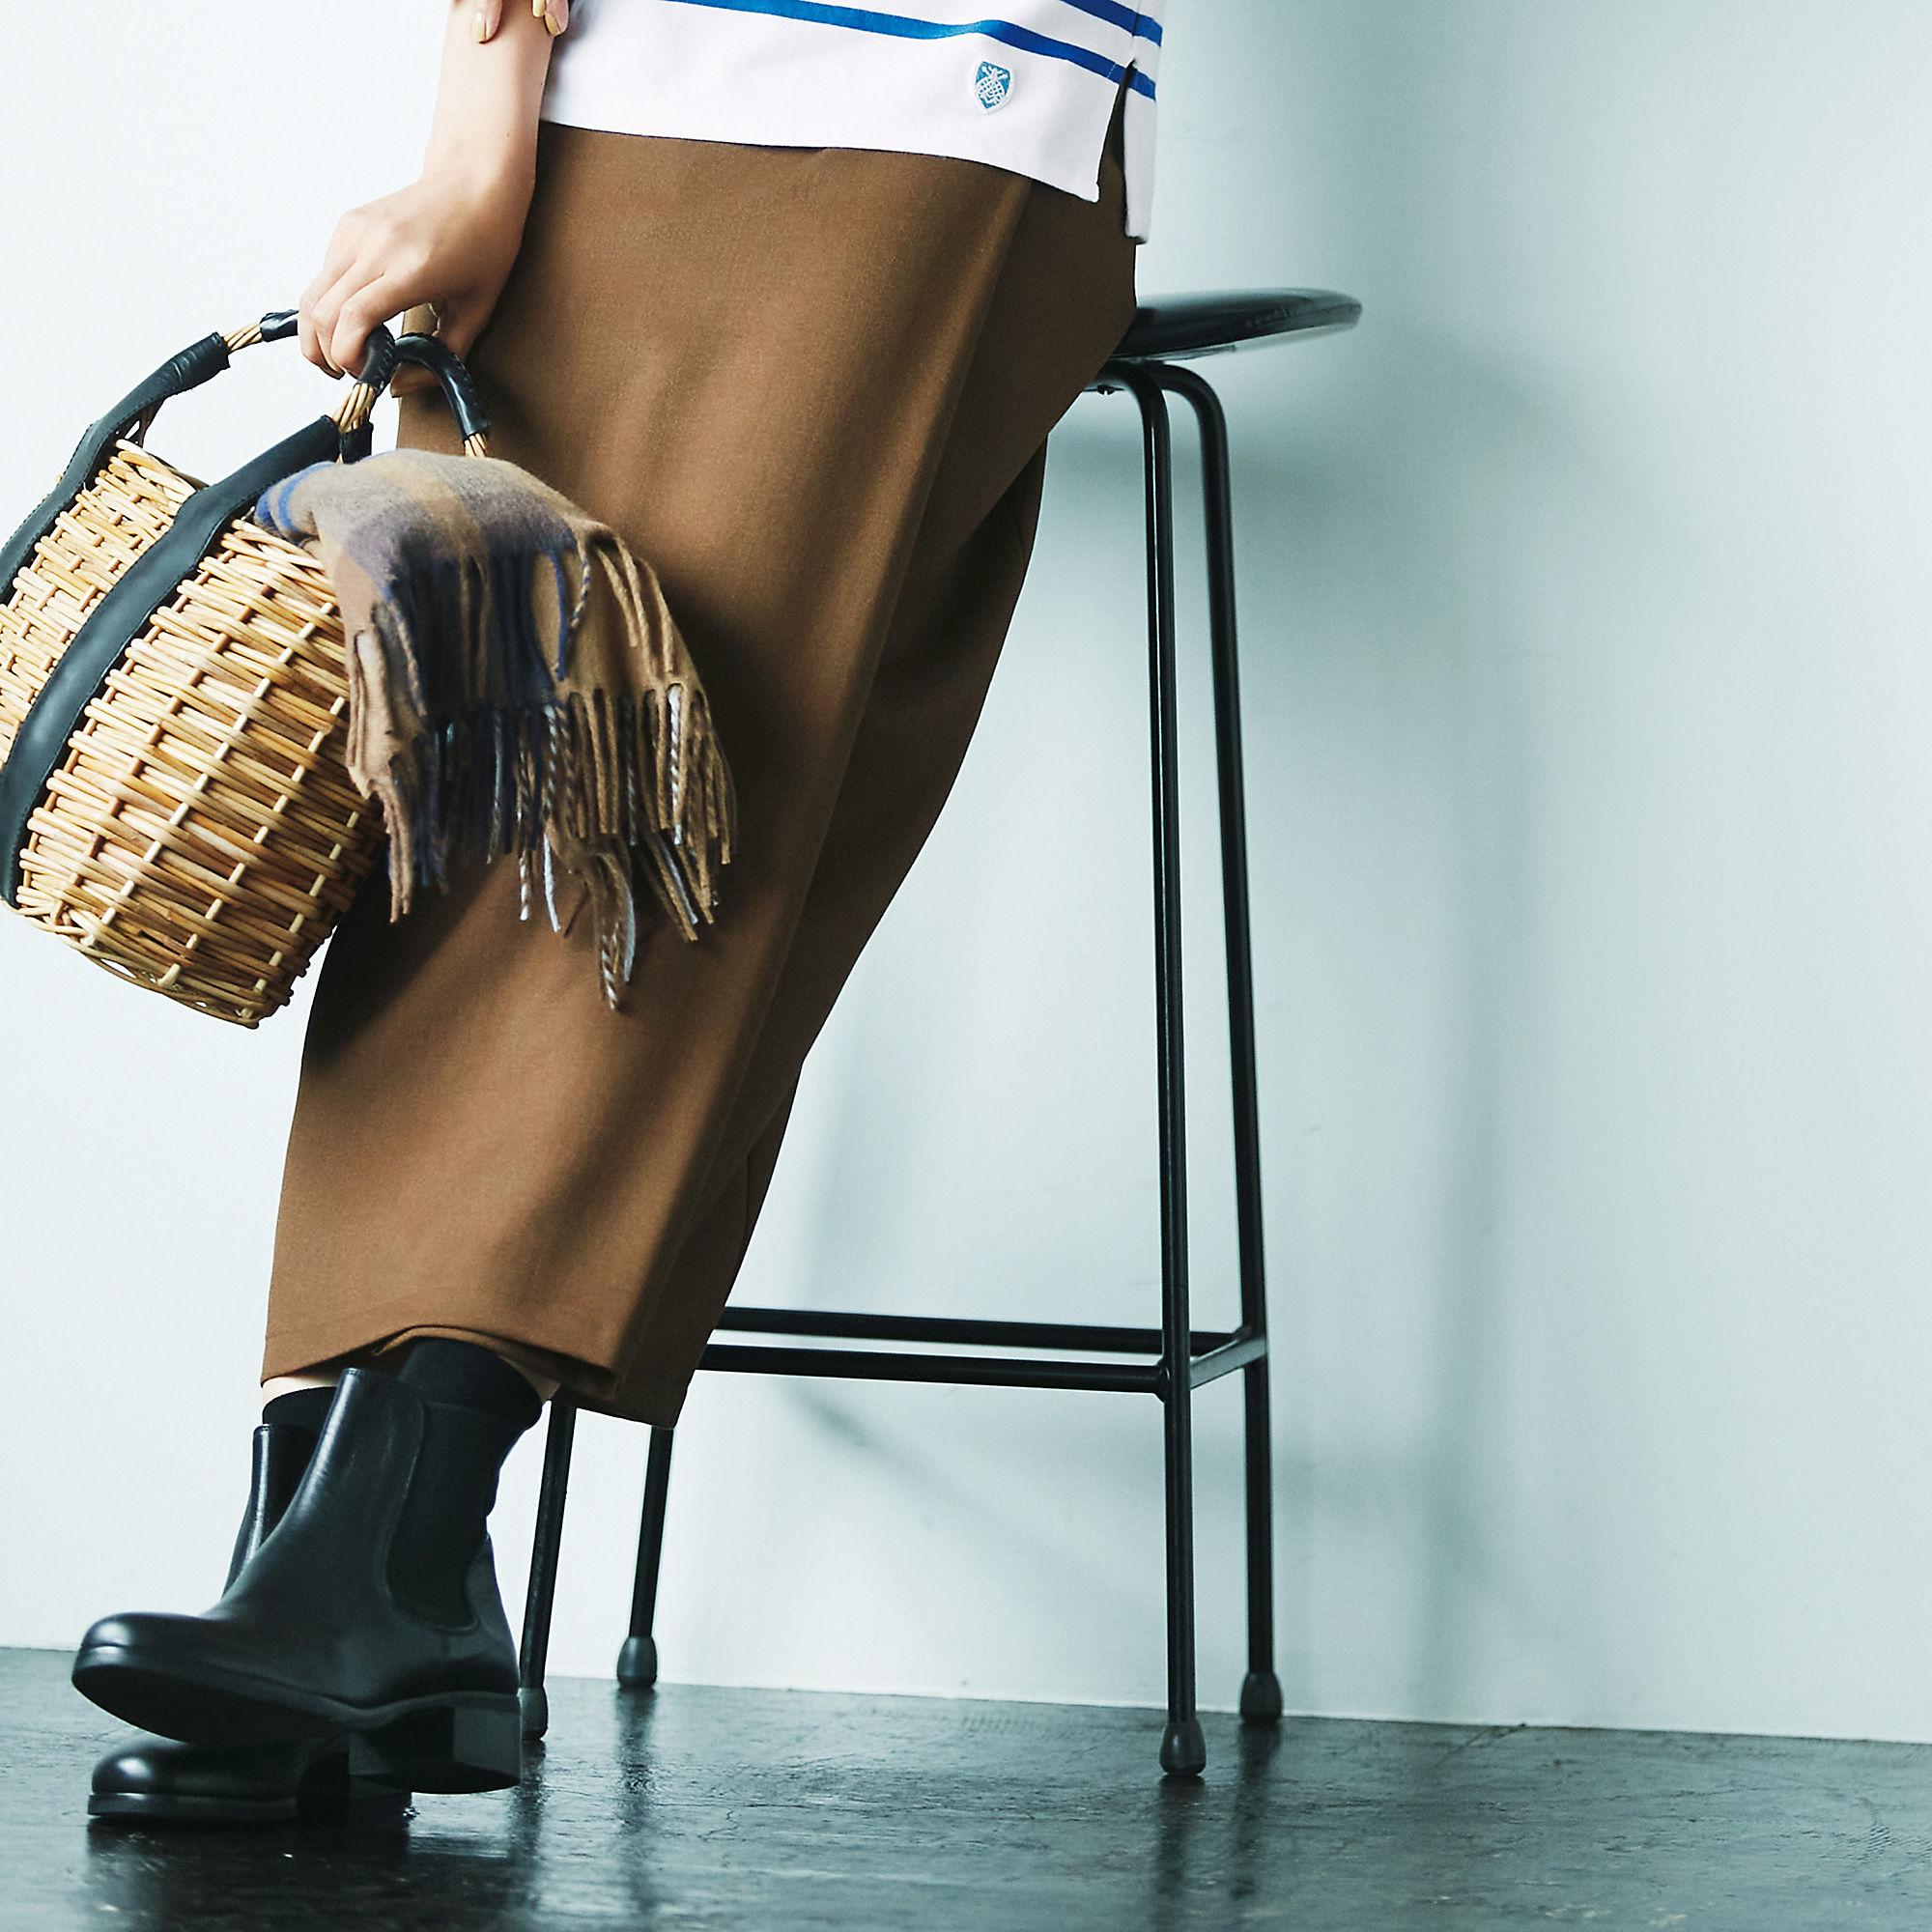 「M7days」のストレッチラップ風スカート